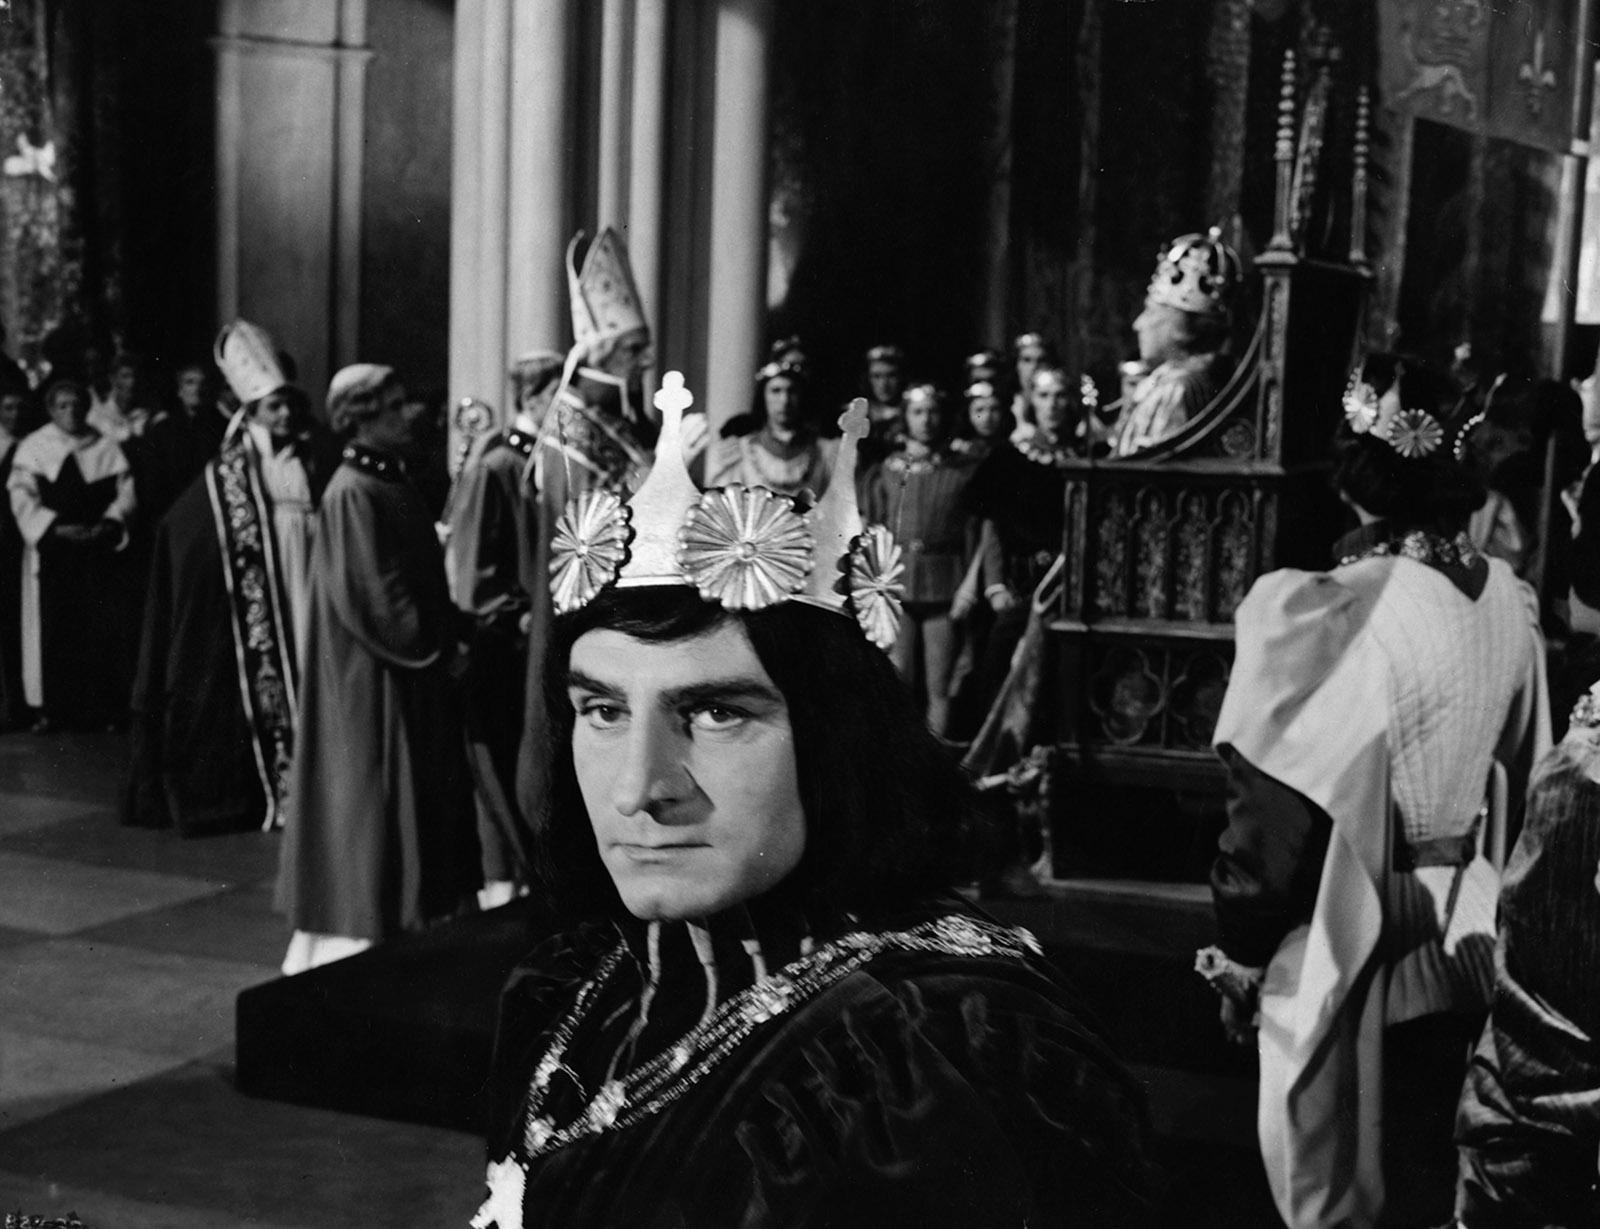 Laurence Olivier in Richard III, 1956